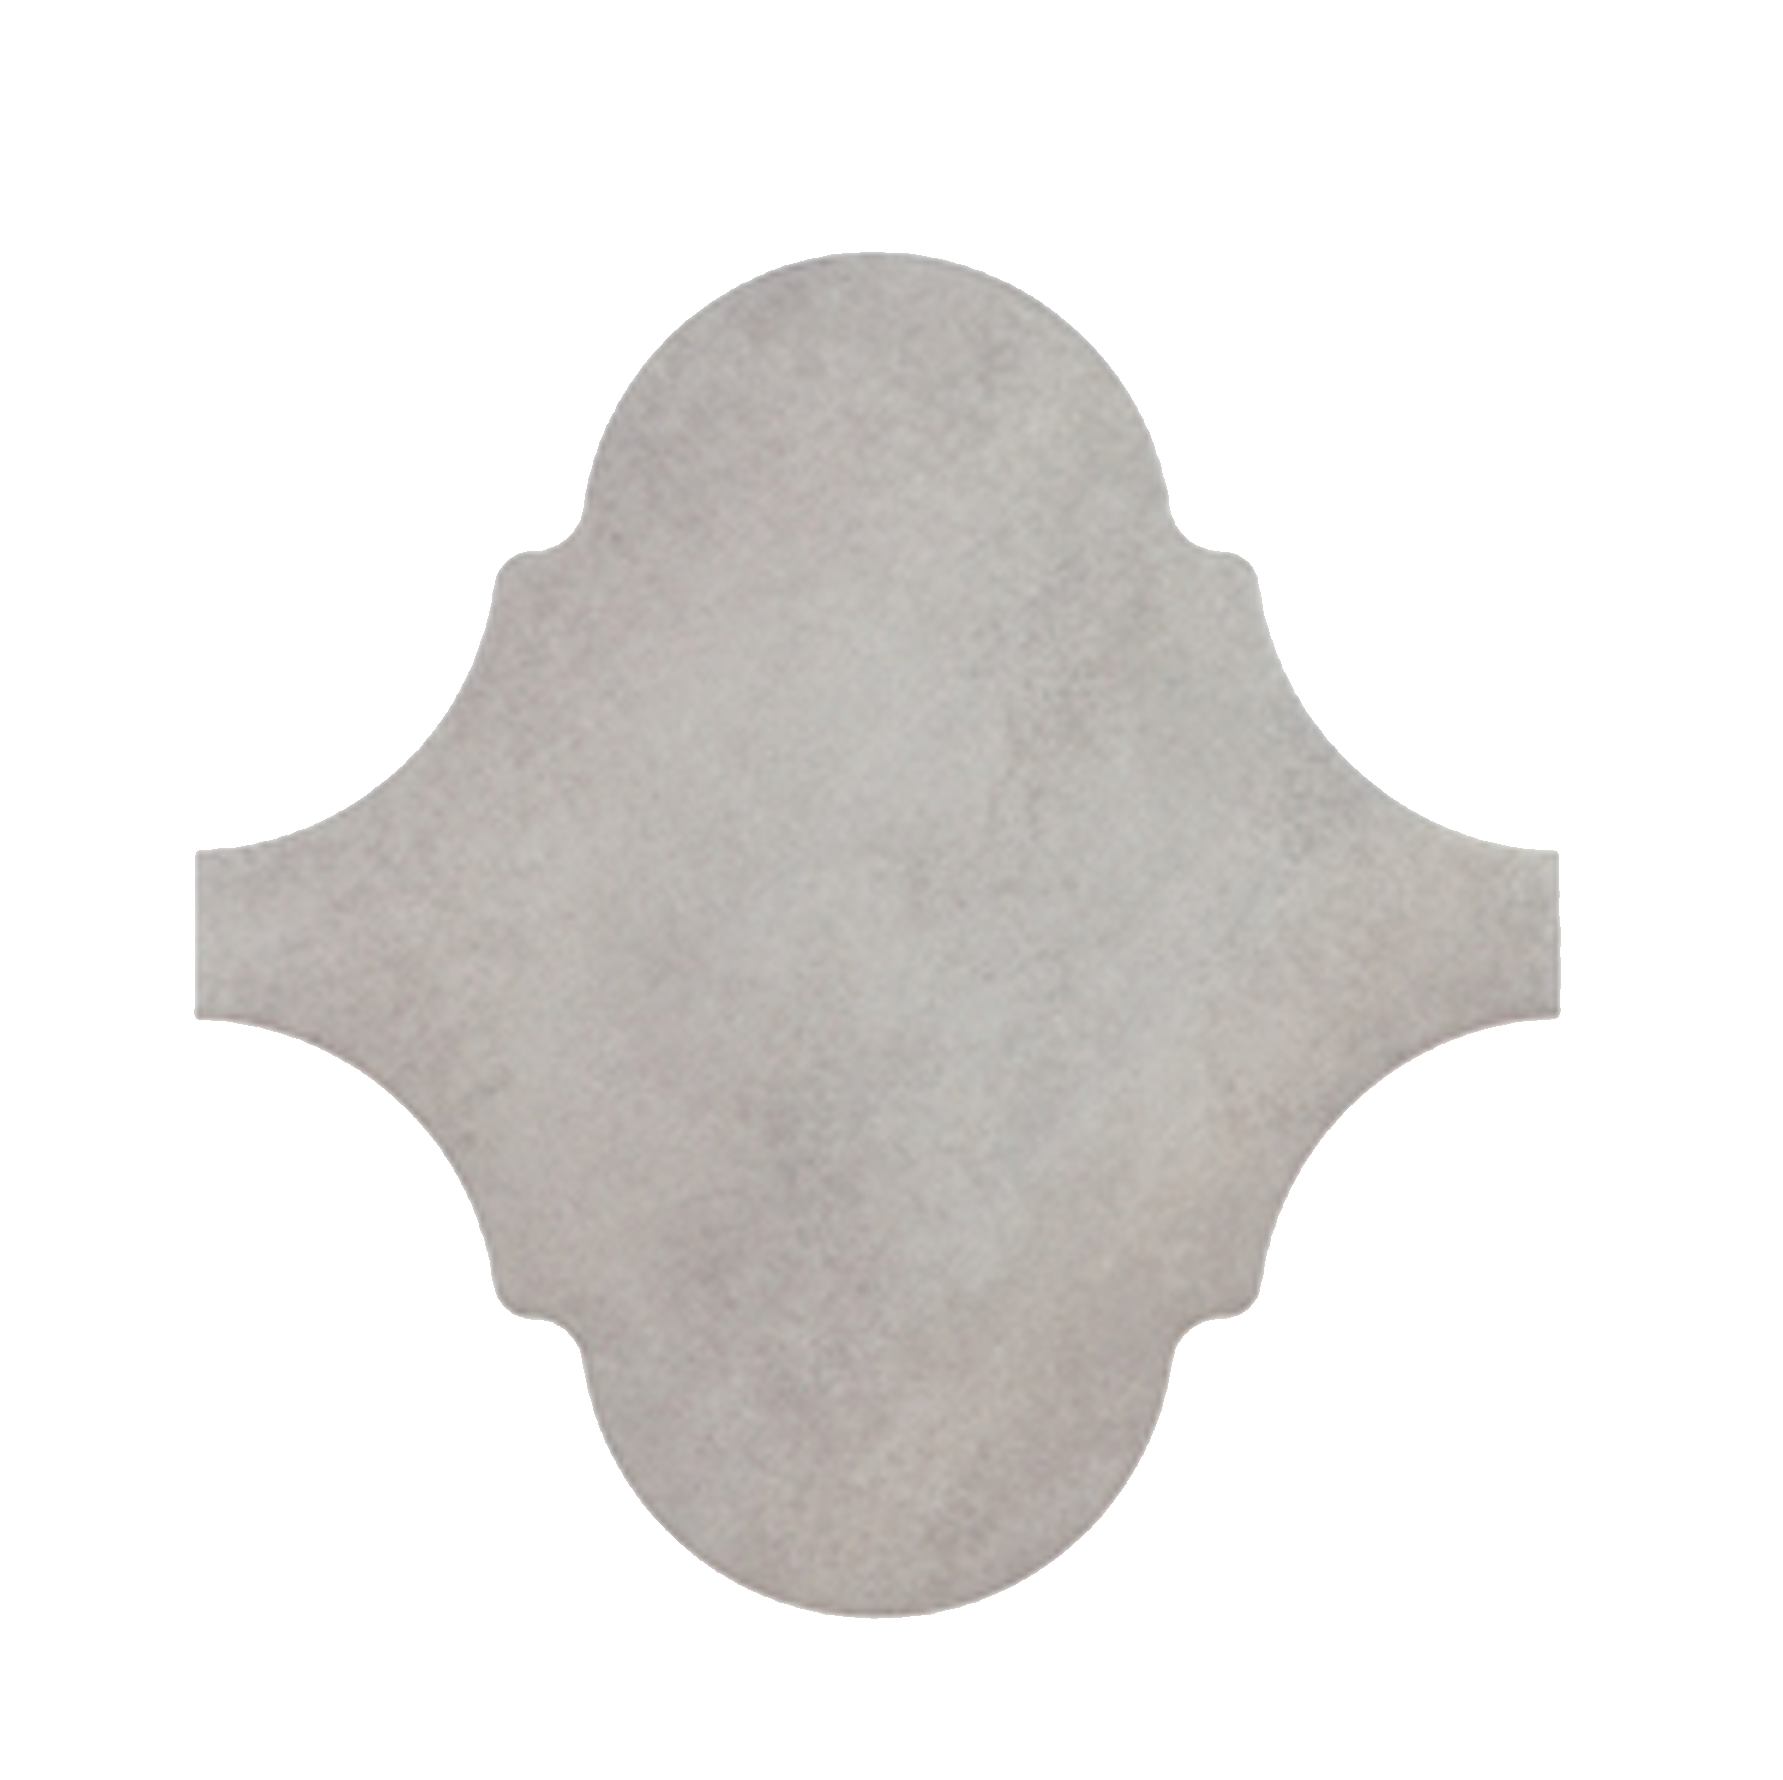 Curvytile Factory Grey 26.5x26.5 cm